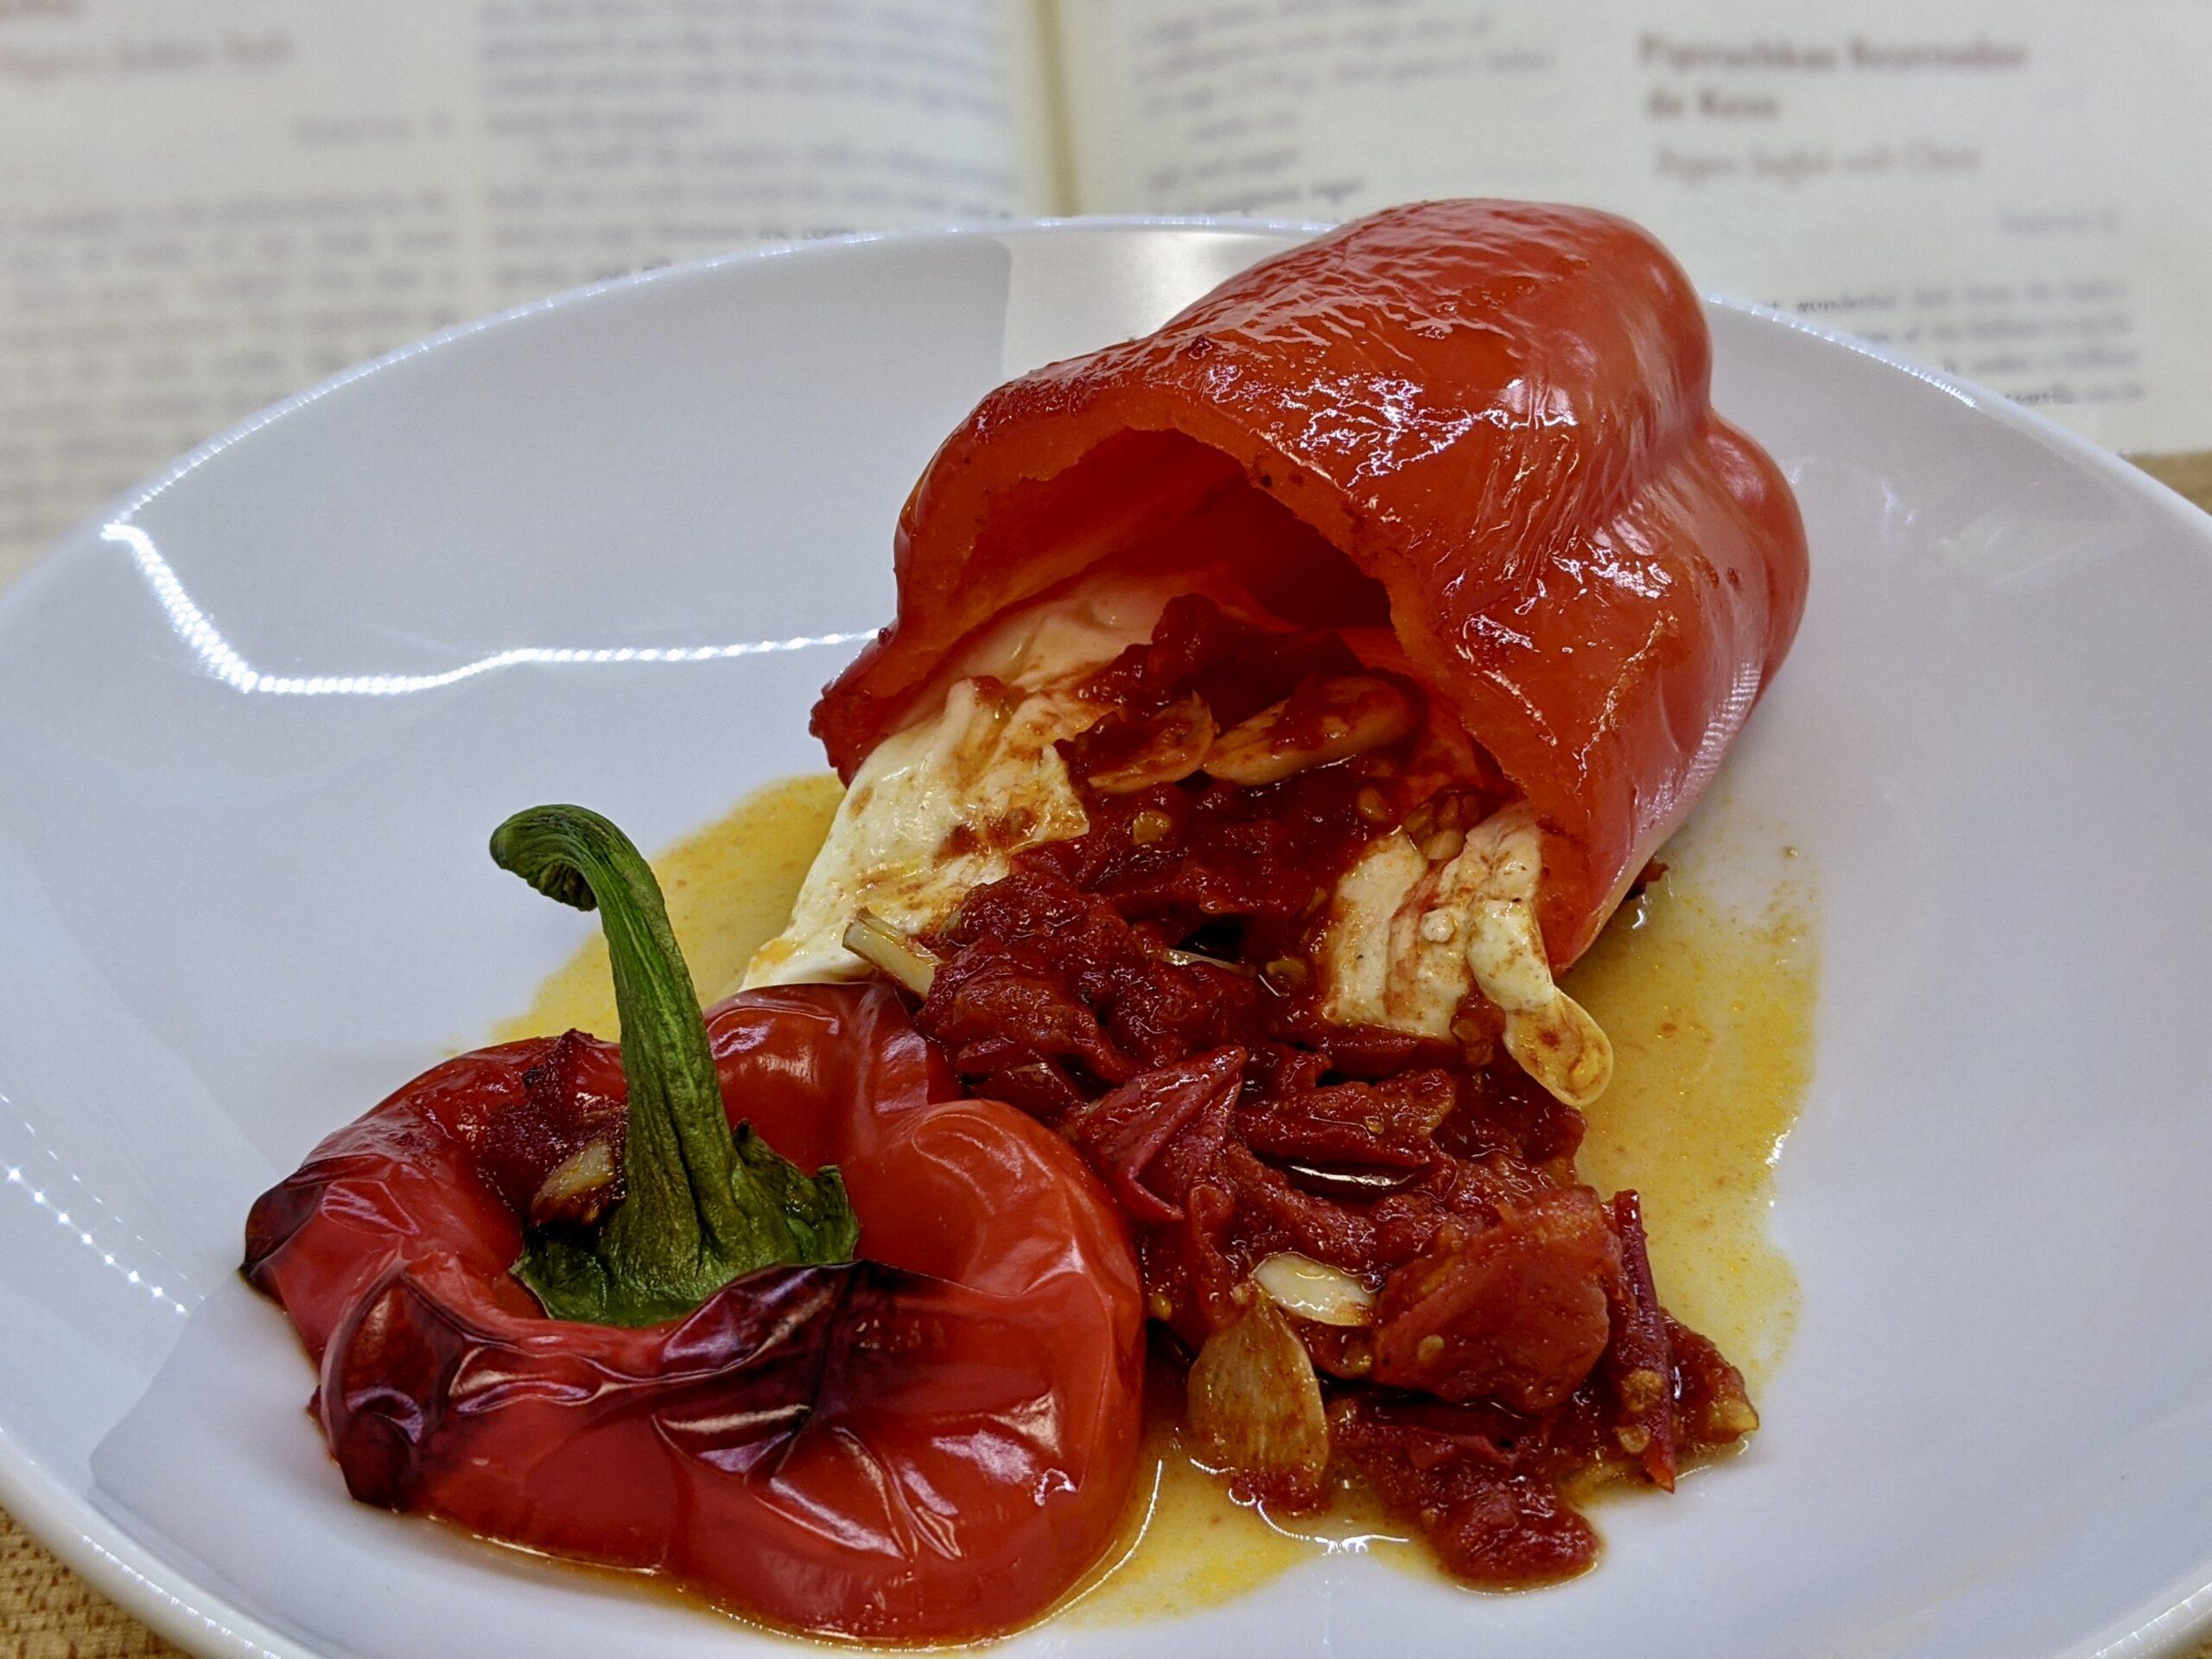 Made In Marrow - Meal 93 Pipiruchkas Reyenadas de Keso - Peppers Stuffed with Cheese